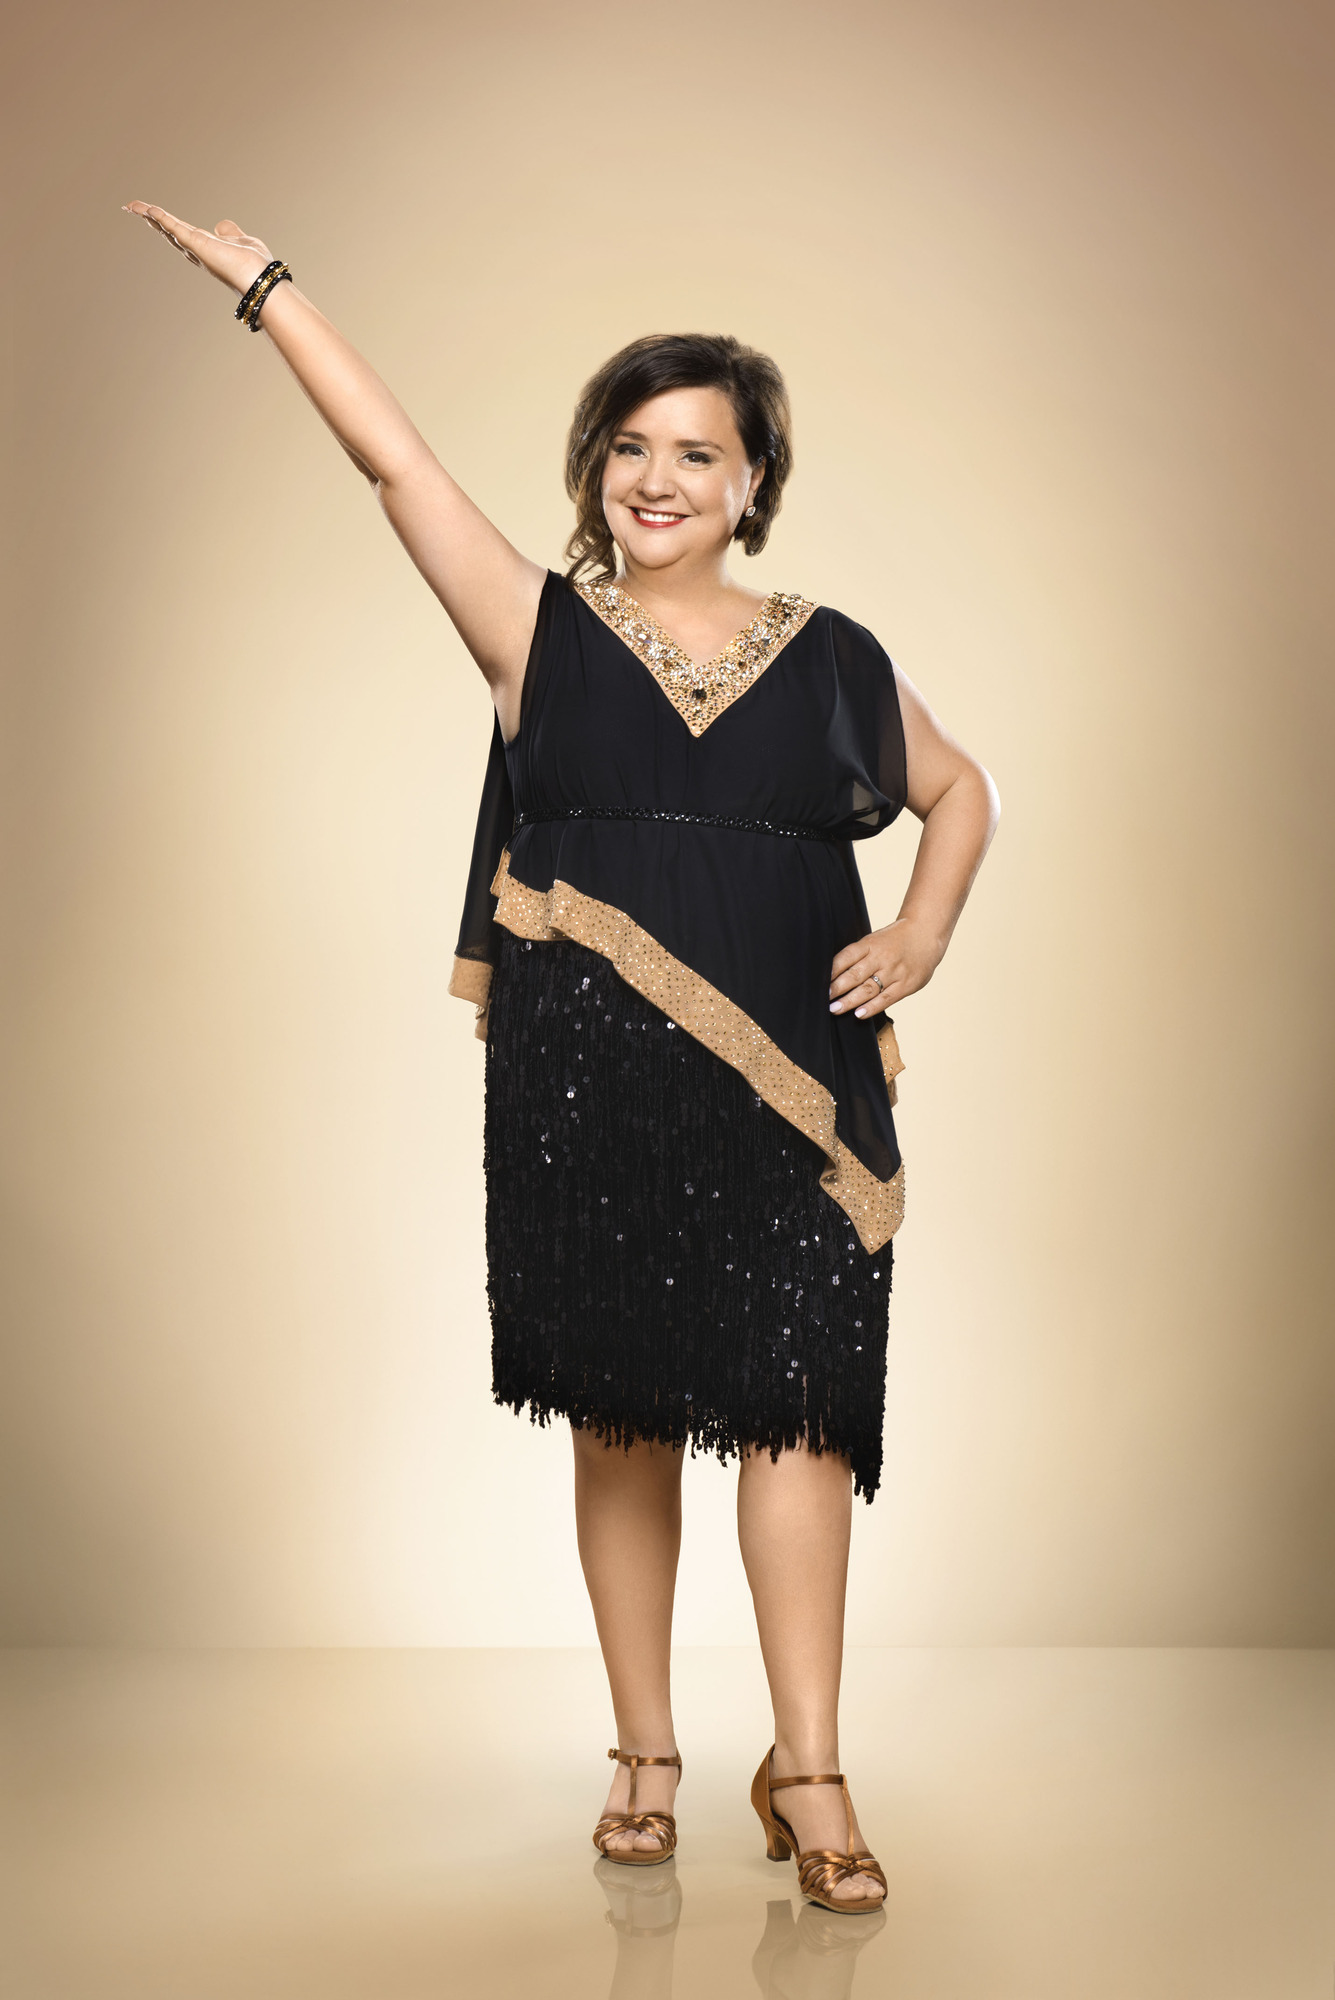 Strictly Come Dancing contestant Susan Calman